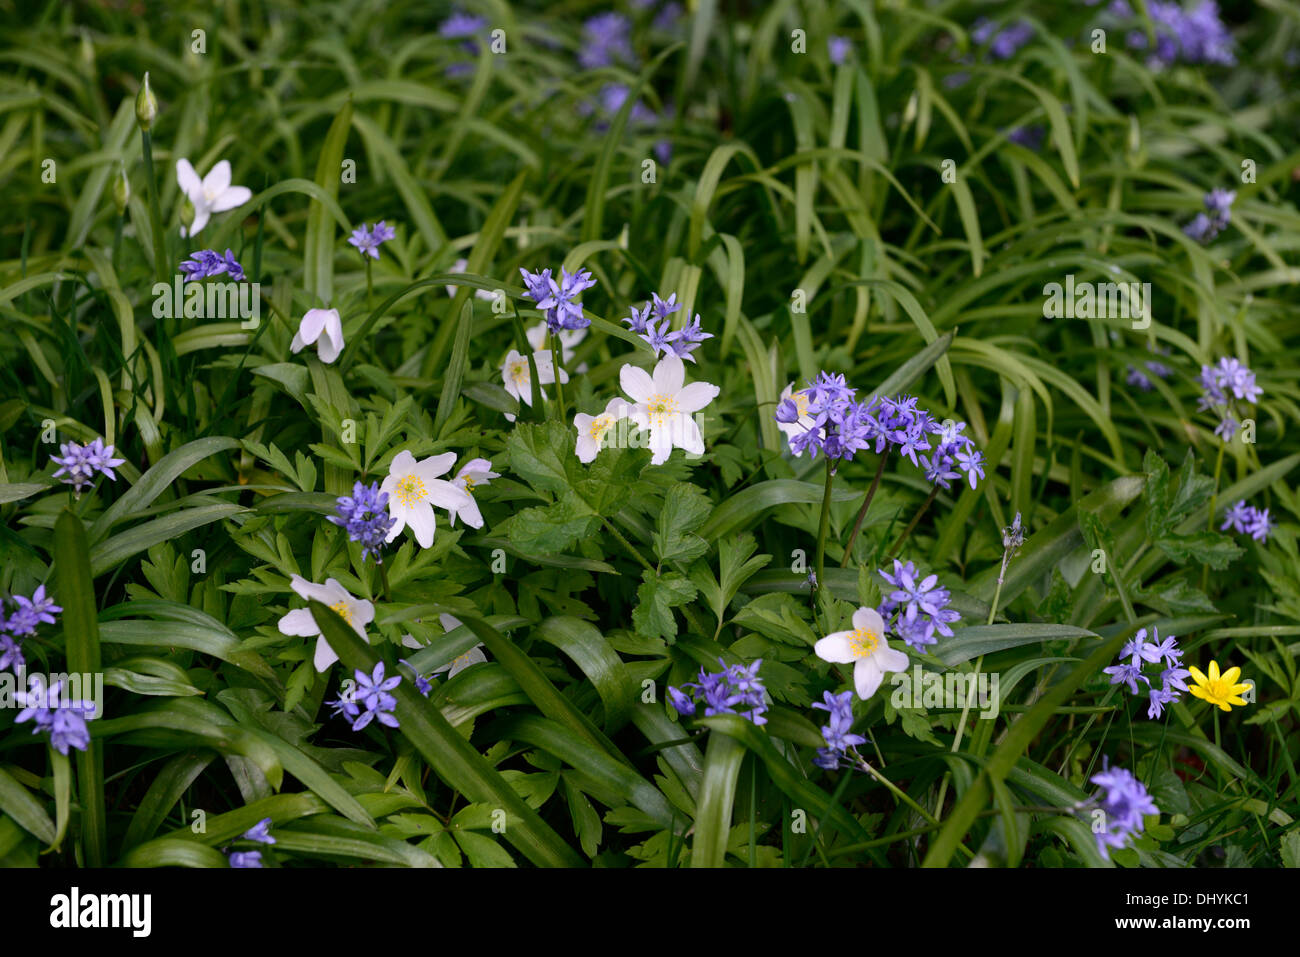 Anemone Nemorosa White Flowers Shade Stock Photos Anemone Nemorosa